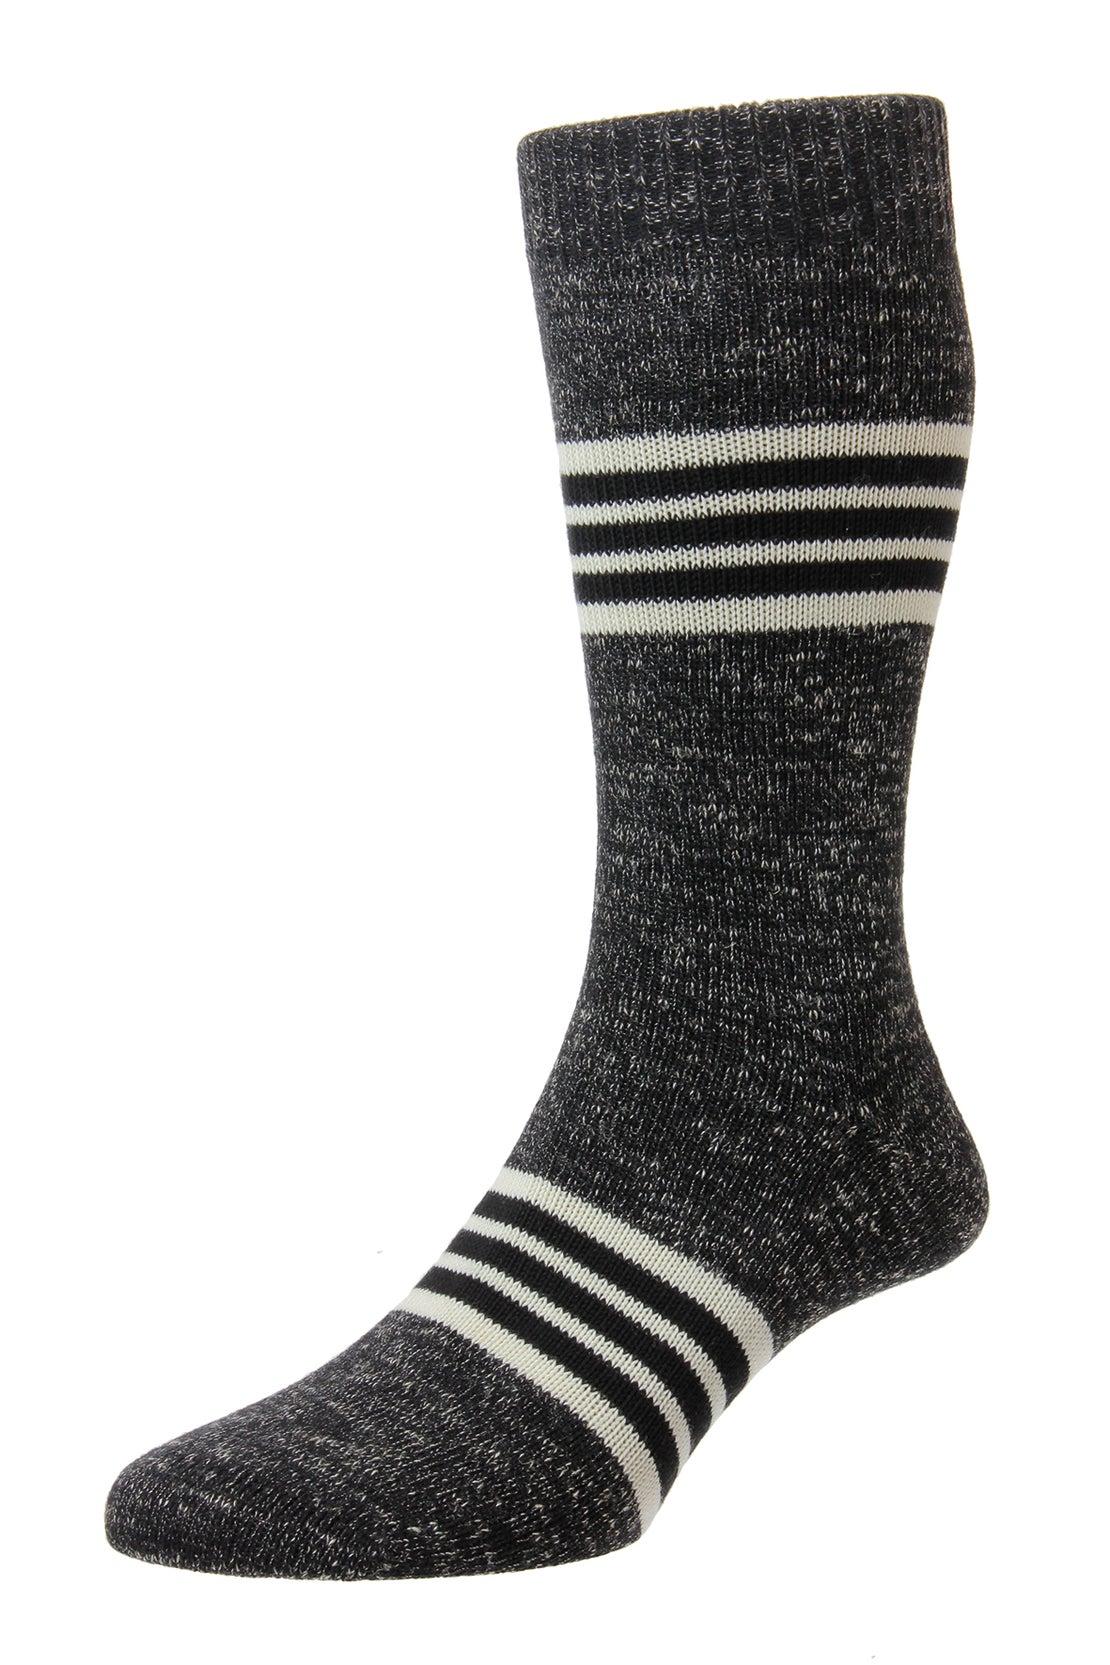 Black Stripe Band Socks